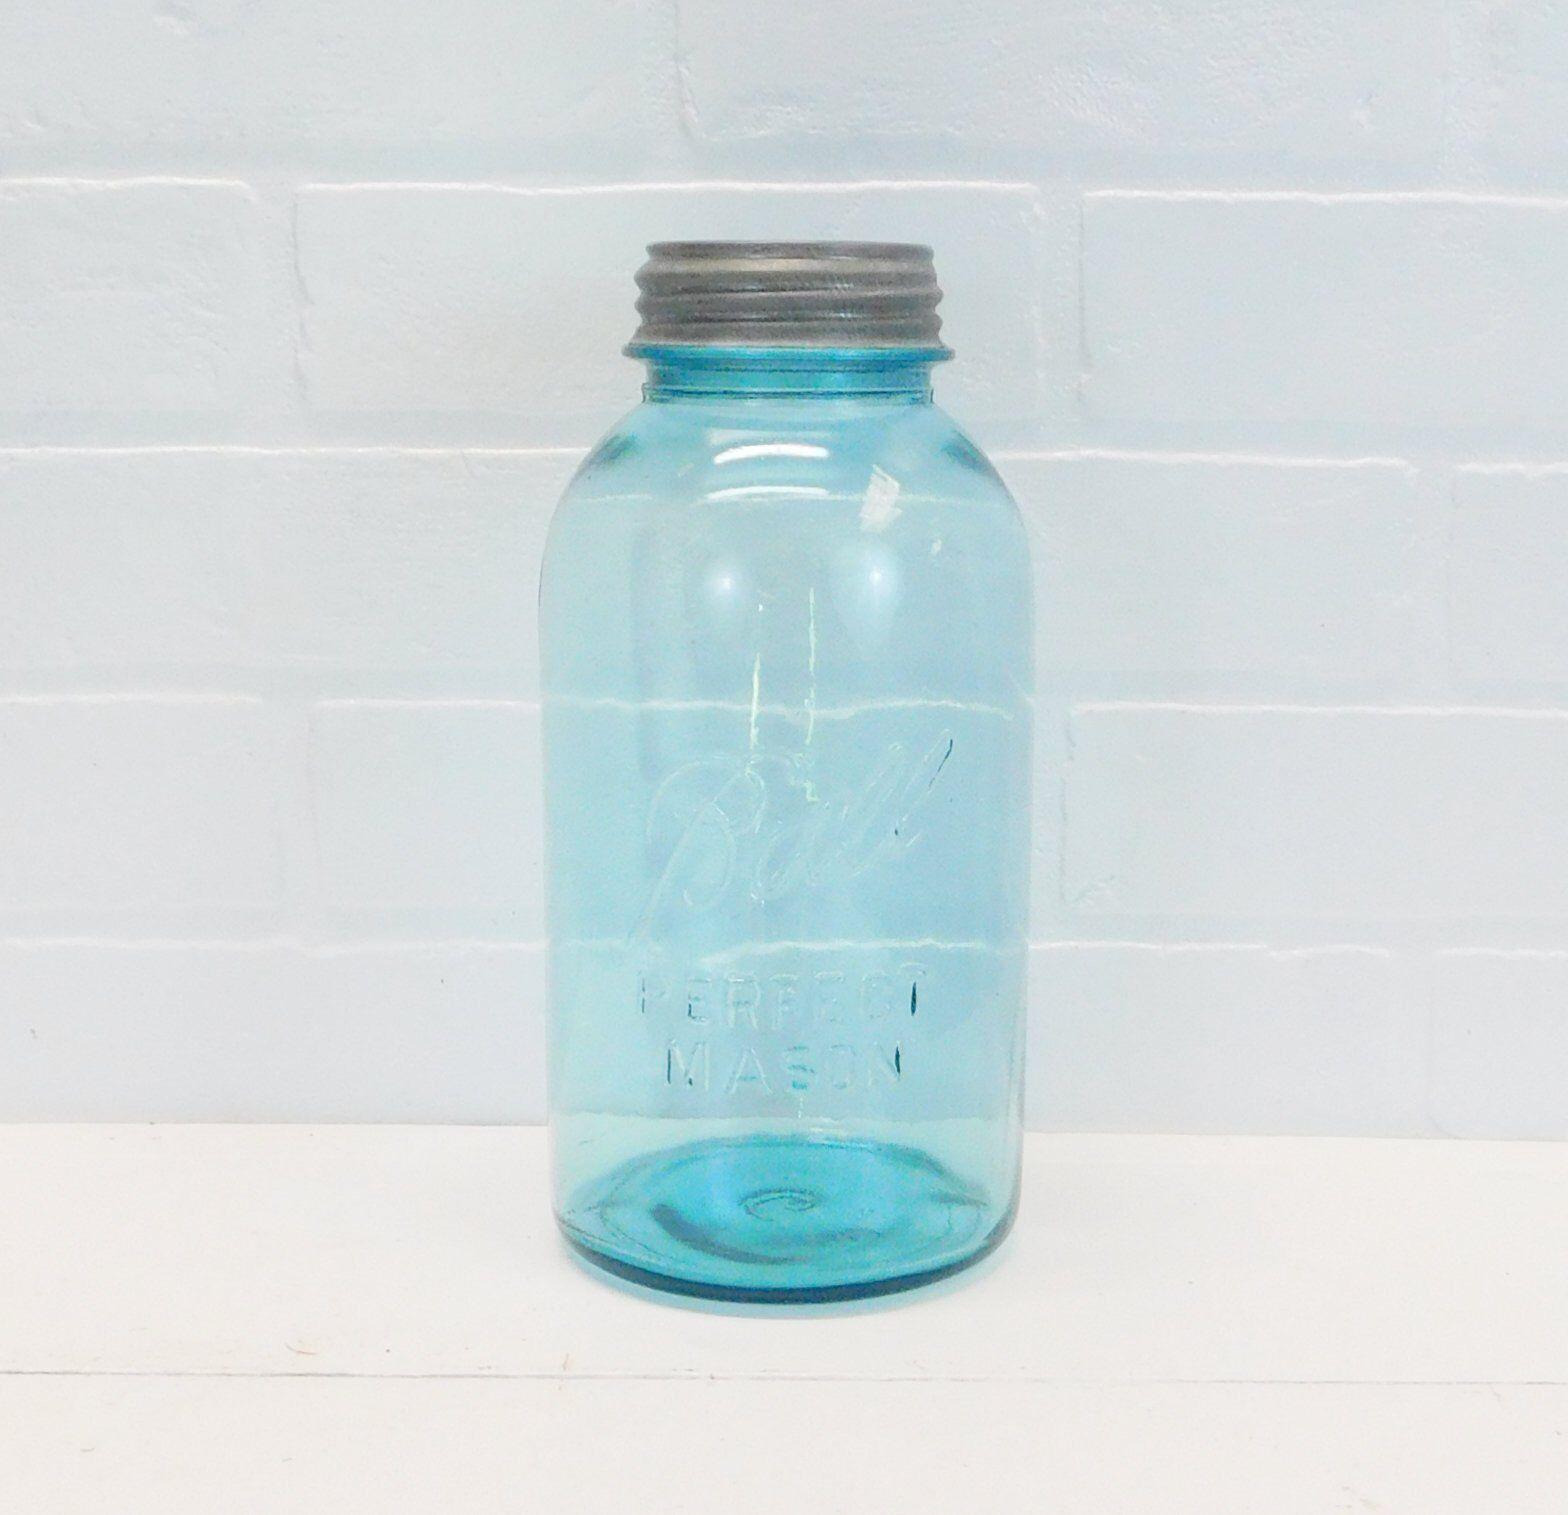 Vintage Blue Ball Mason Jar, Half Gallon Jar with Zinc Lid